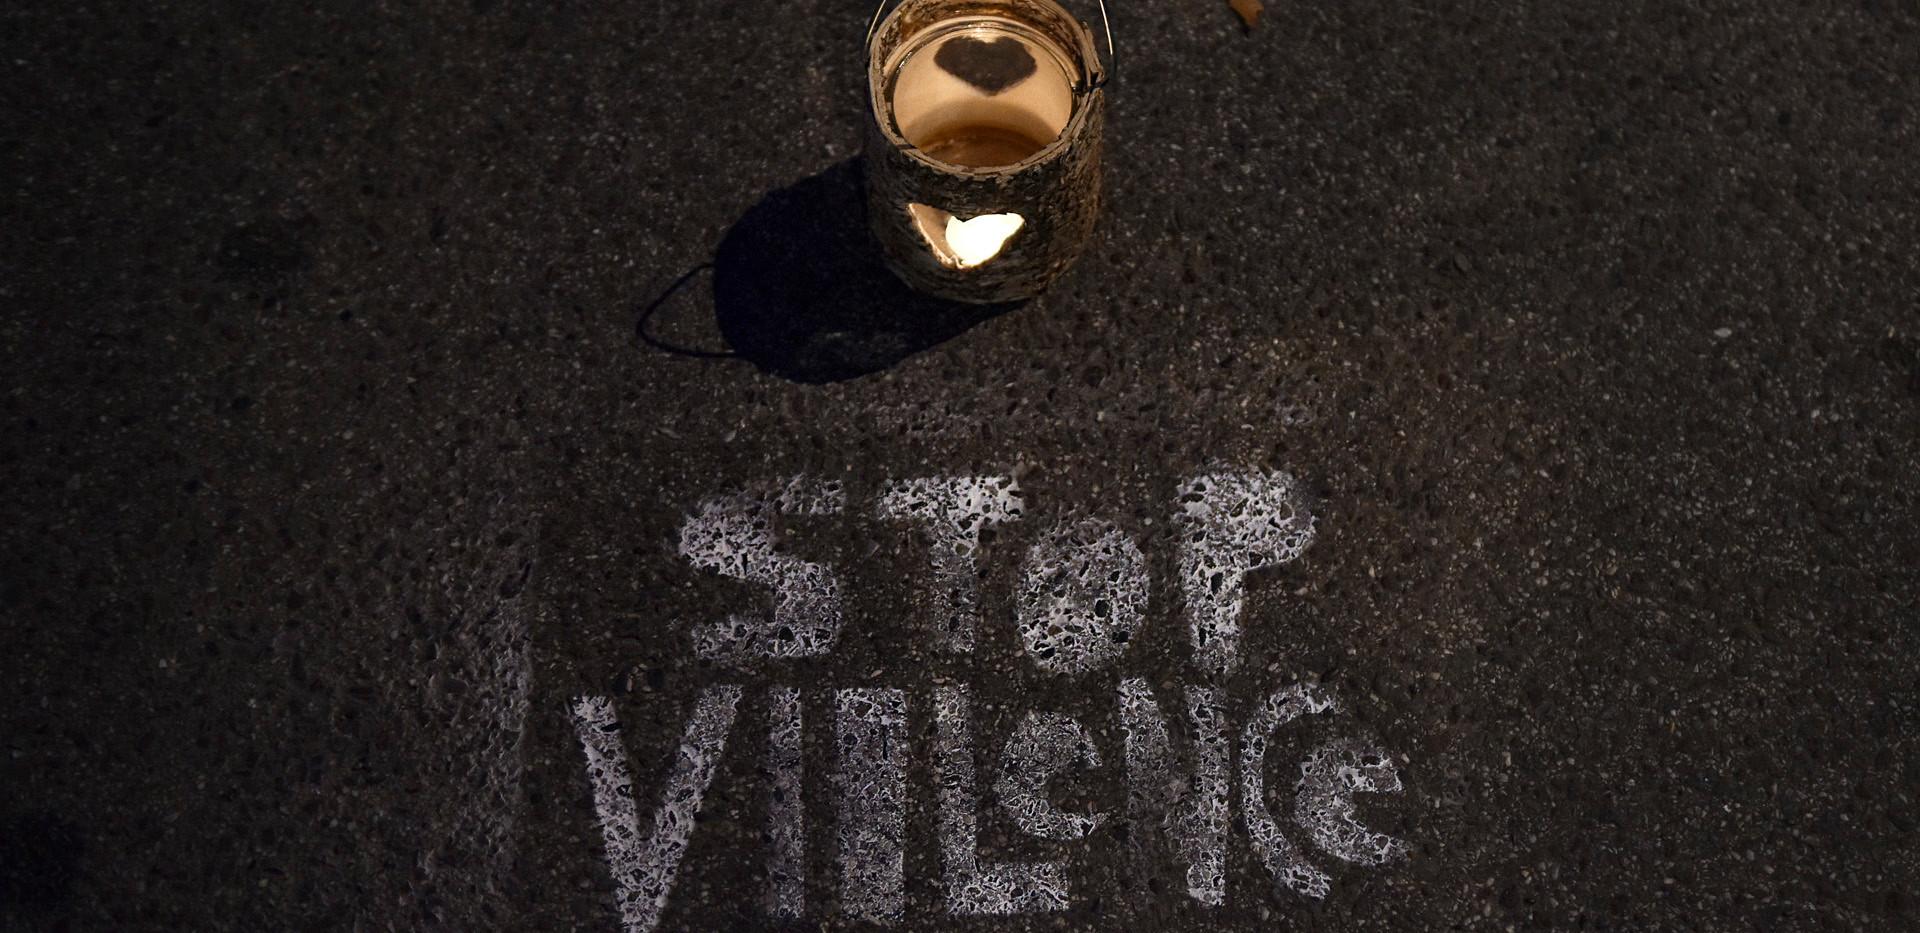 Veillée violence 2019 WEB ©florencezuffe